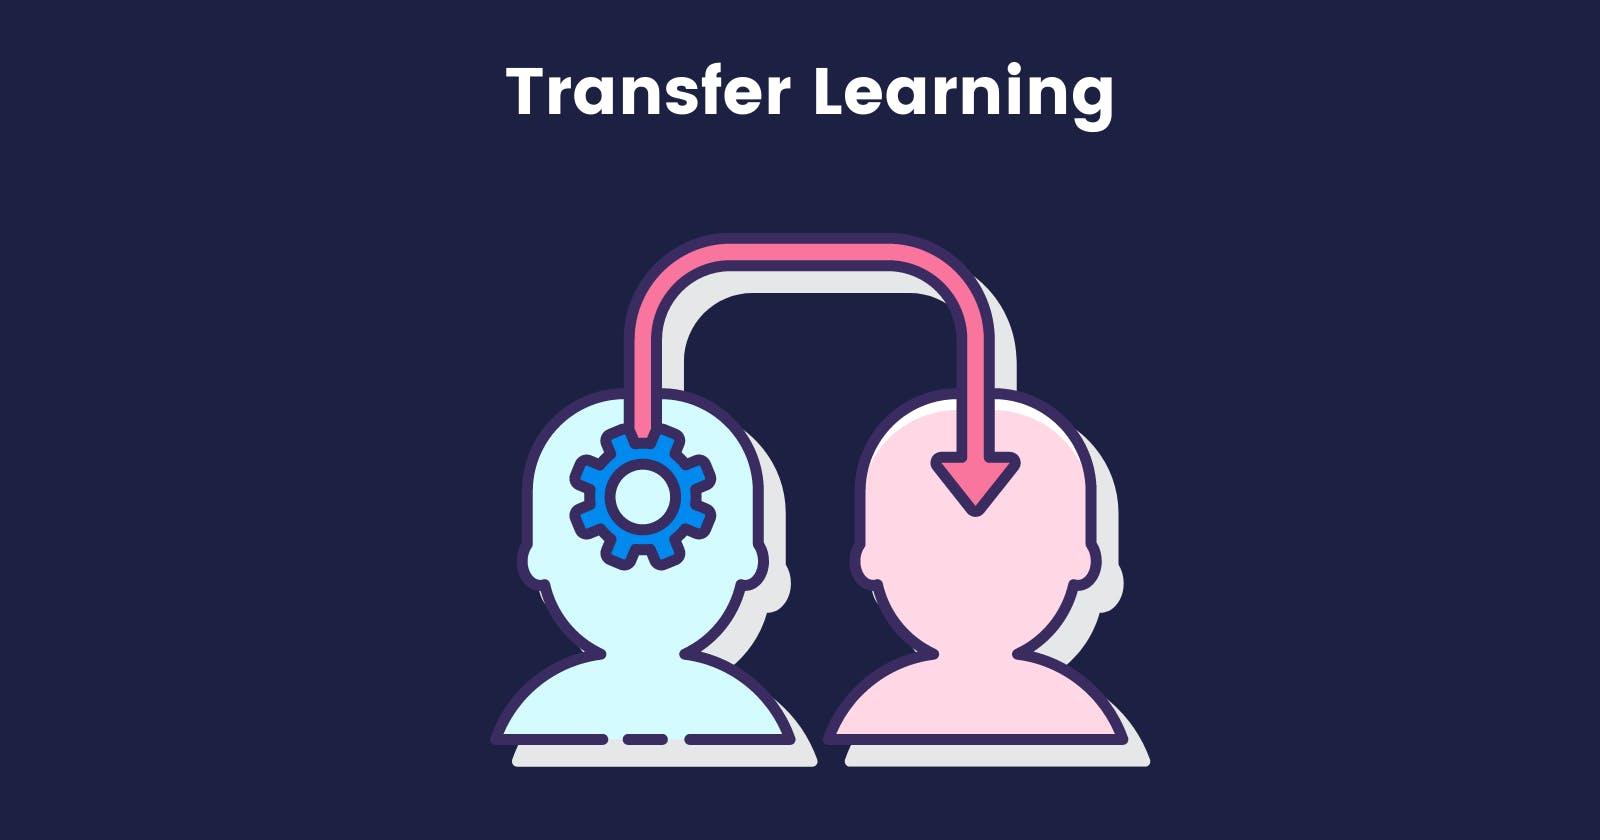 Transfer Learning Explained